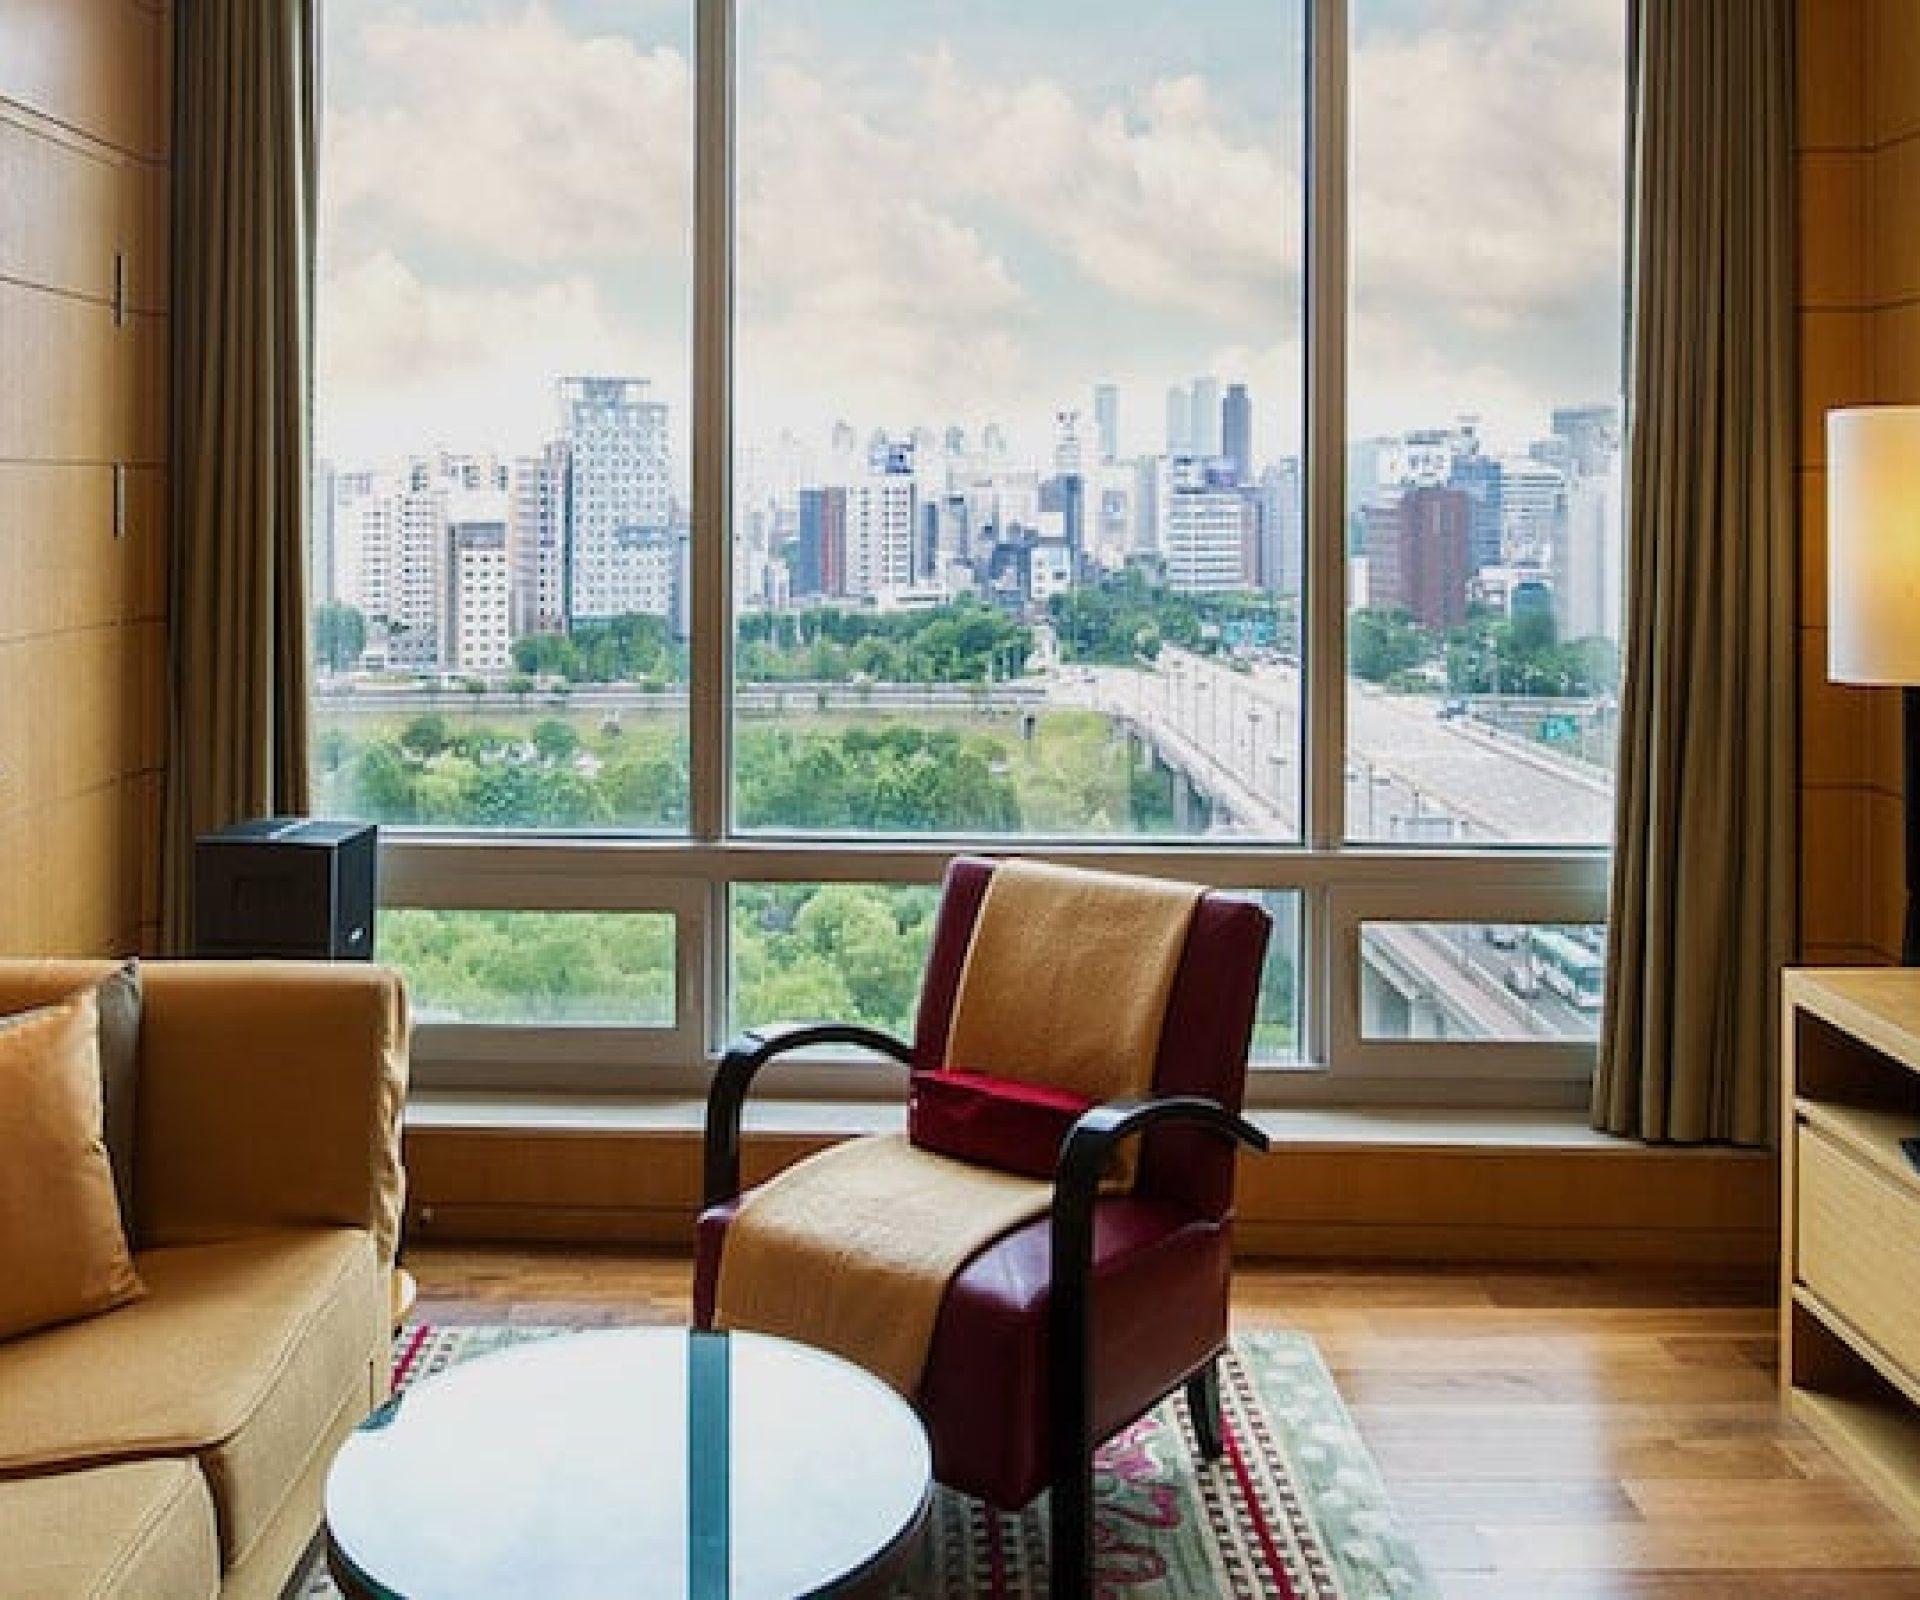 Marriott Executive Apartments | Yeongdeungpo-gu, Seoul